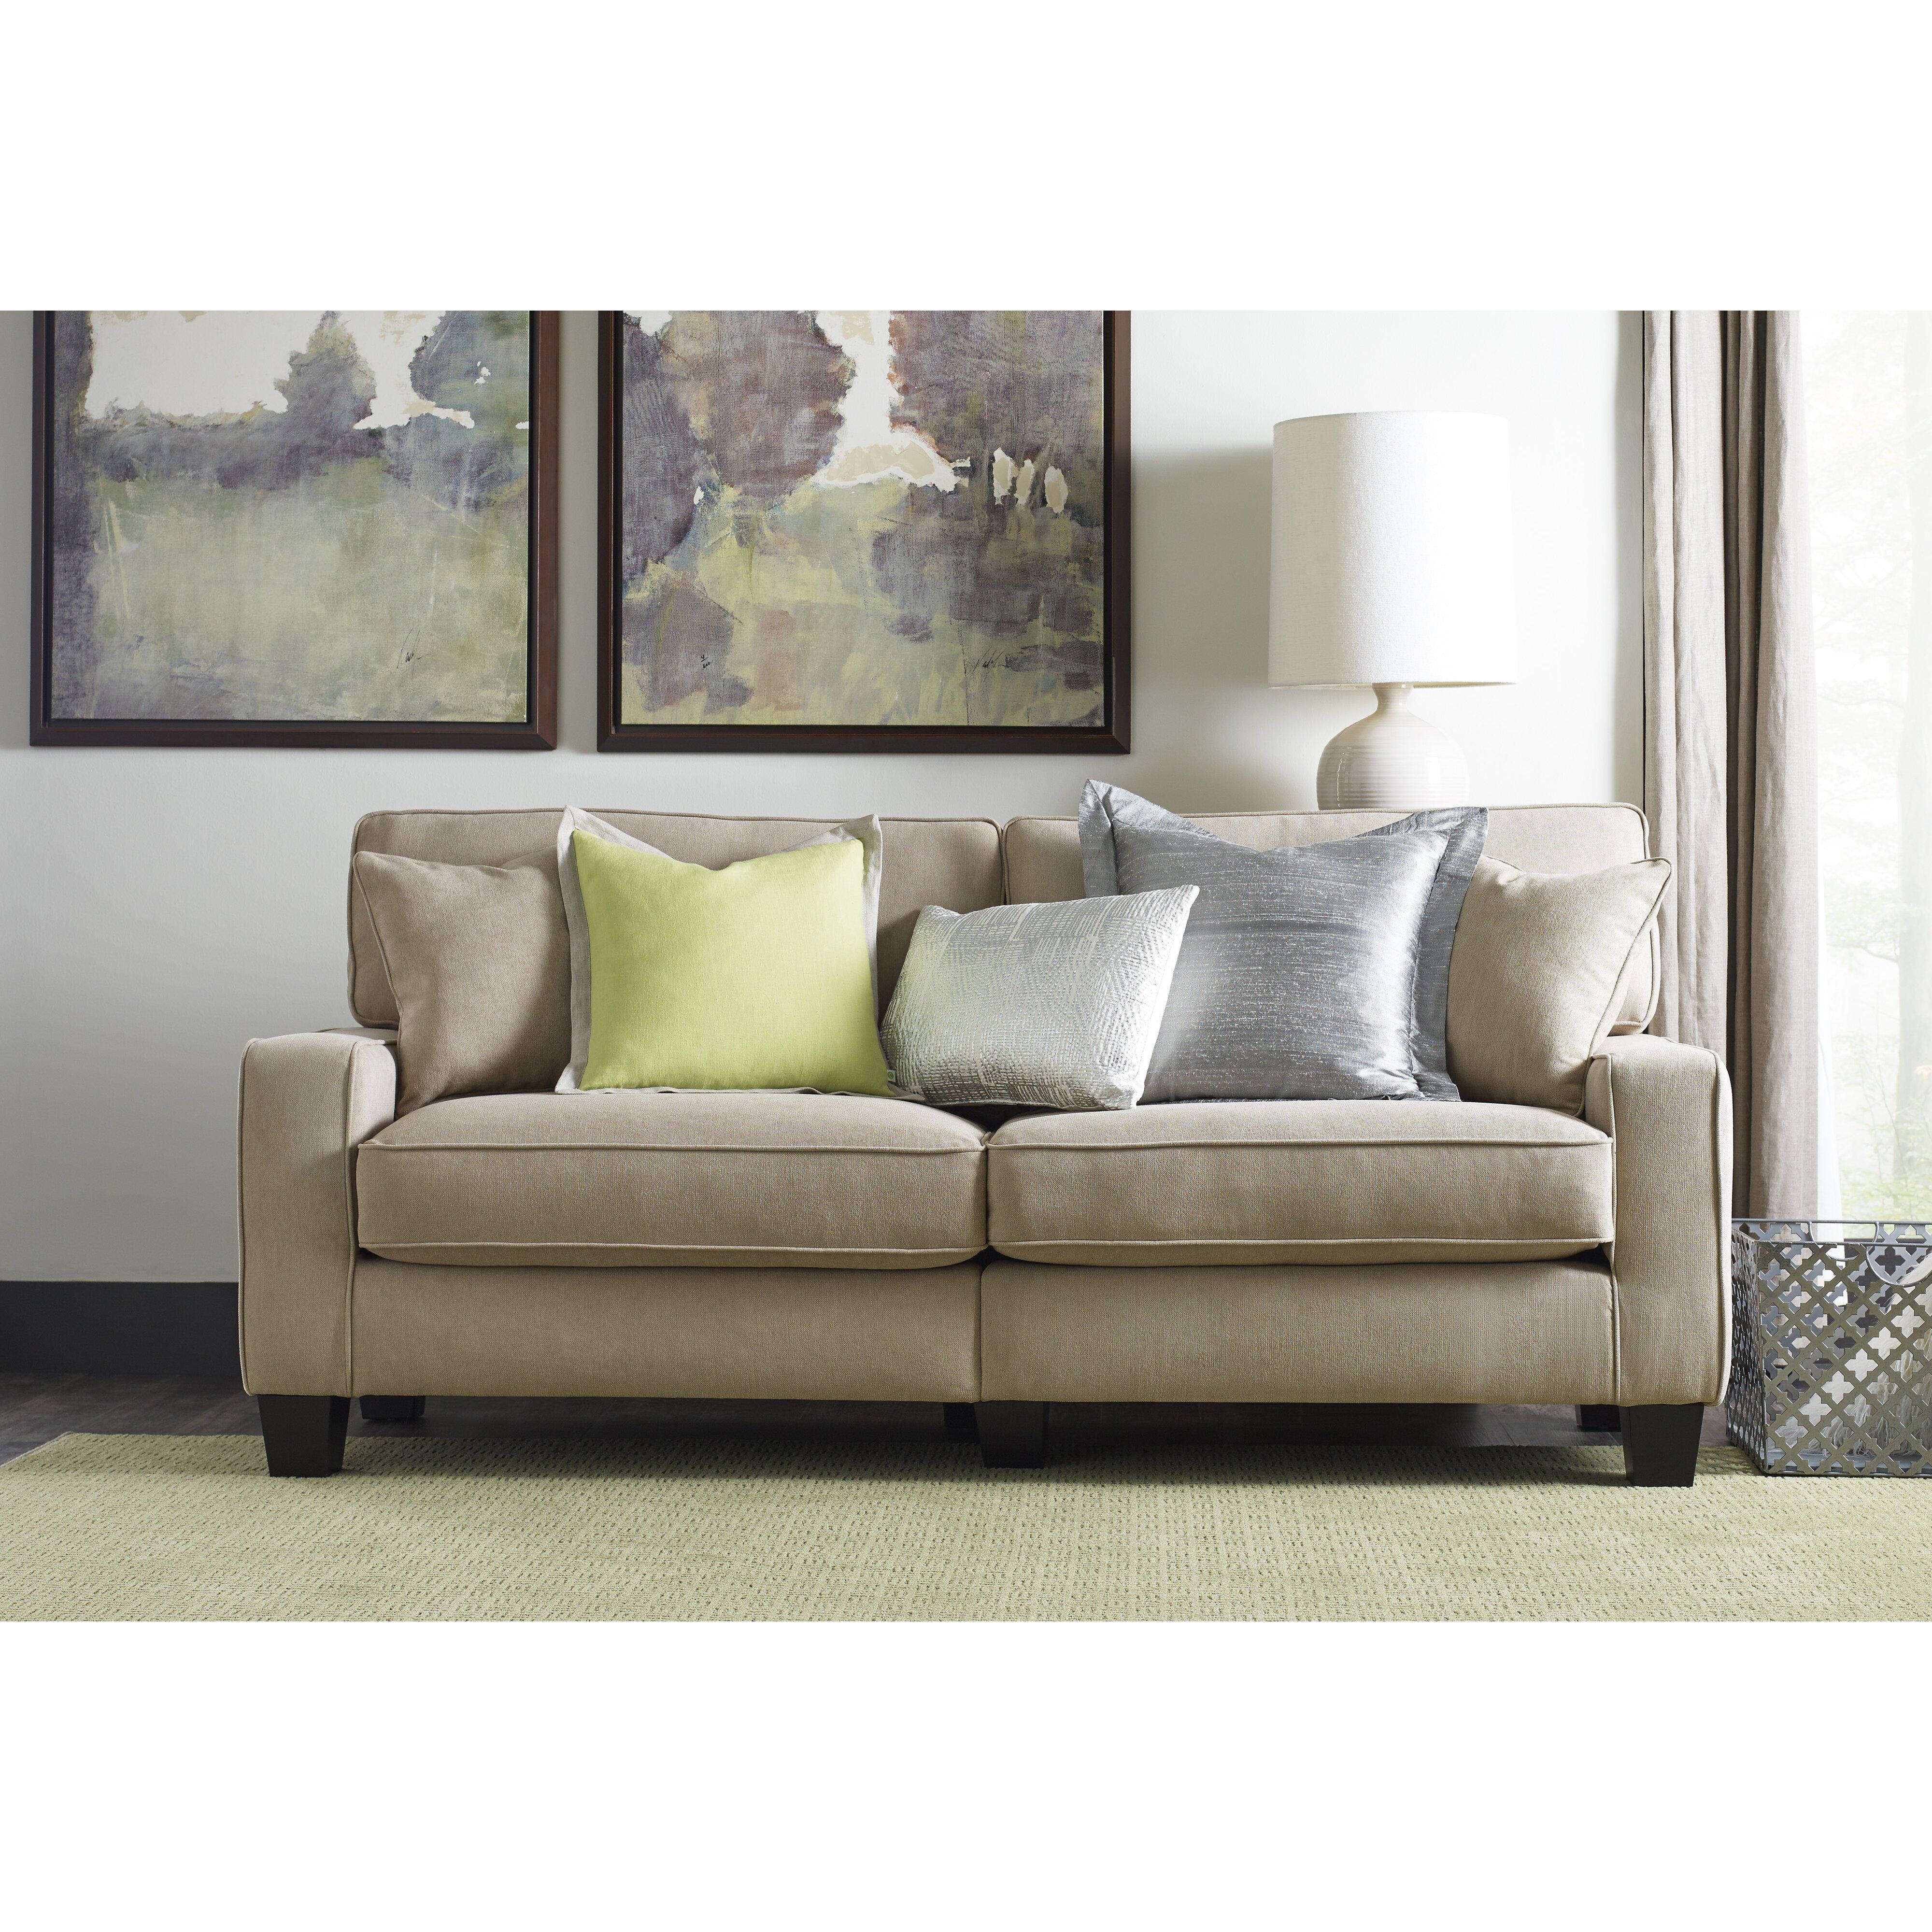 Sofa Shining Home Design